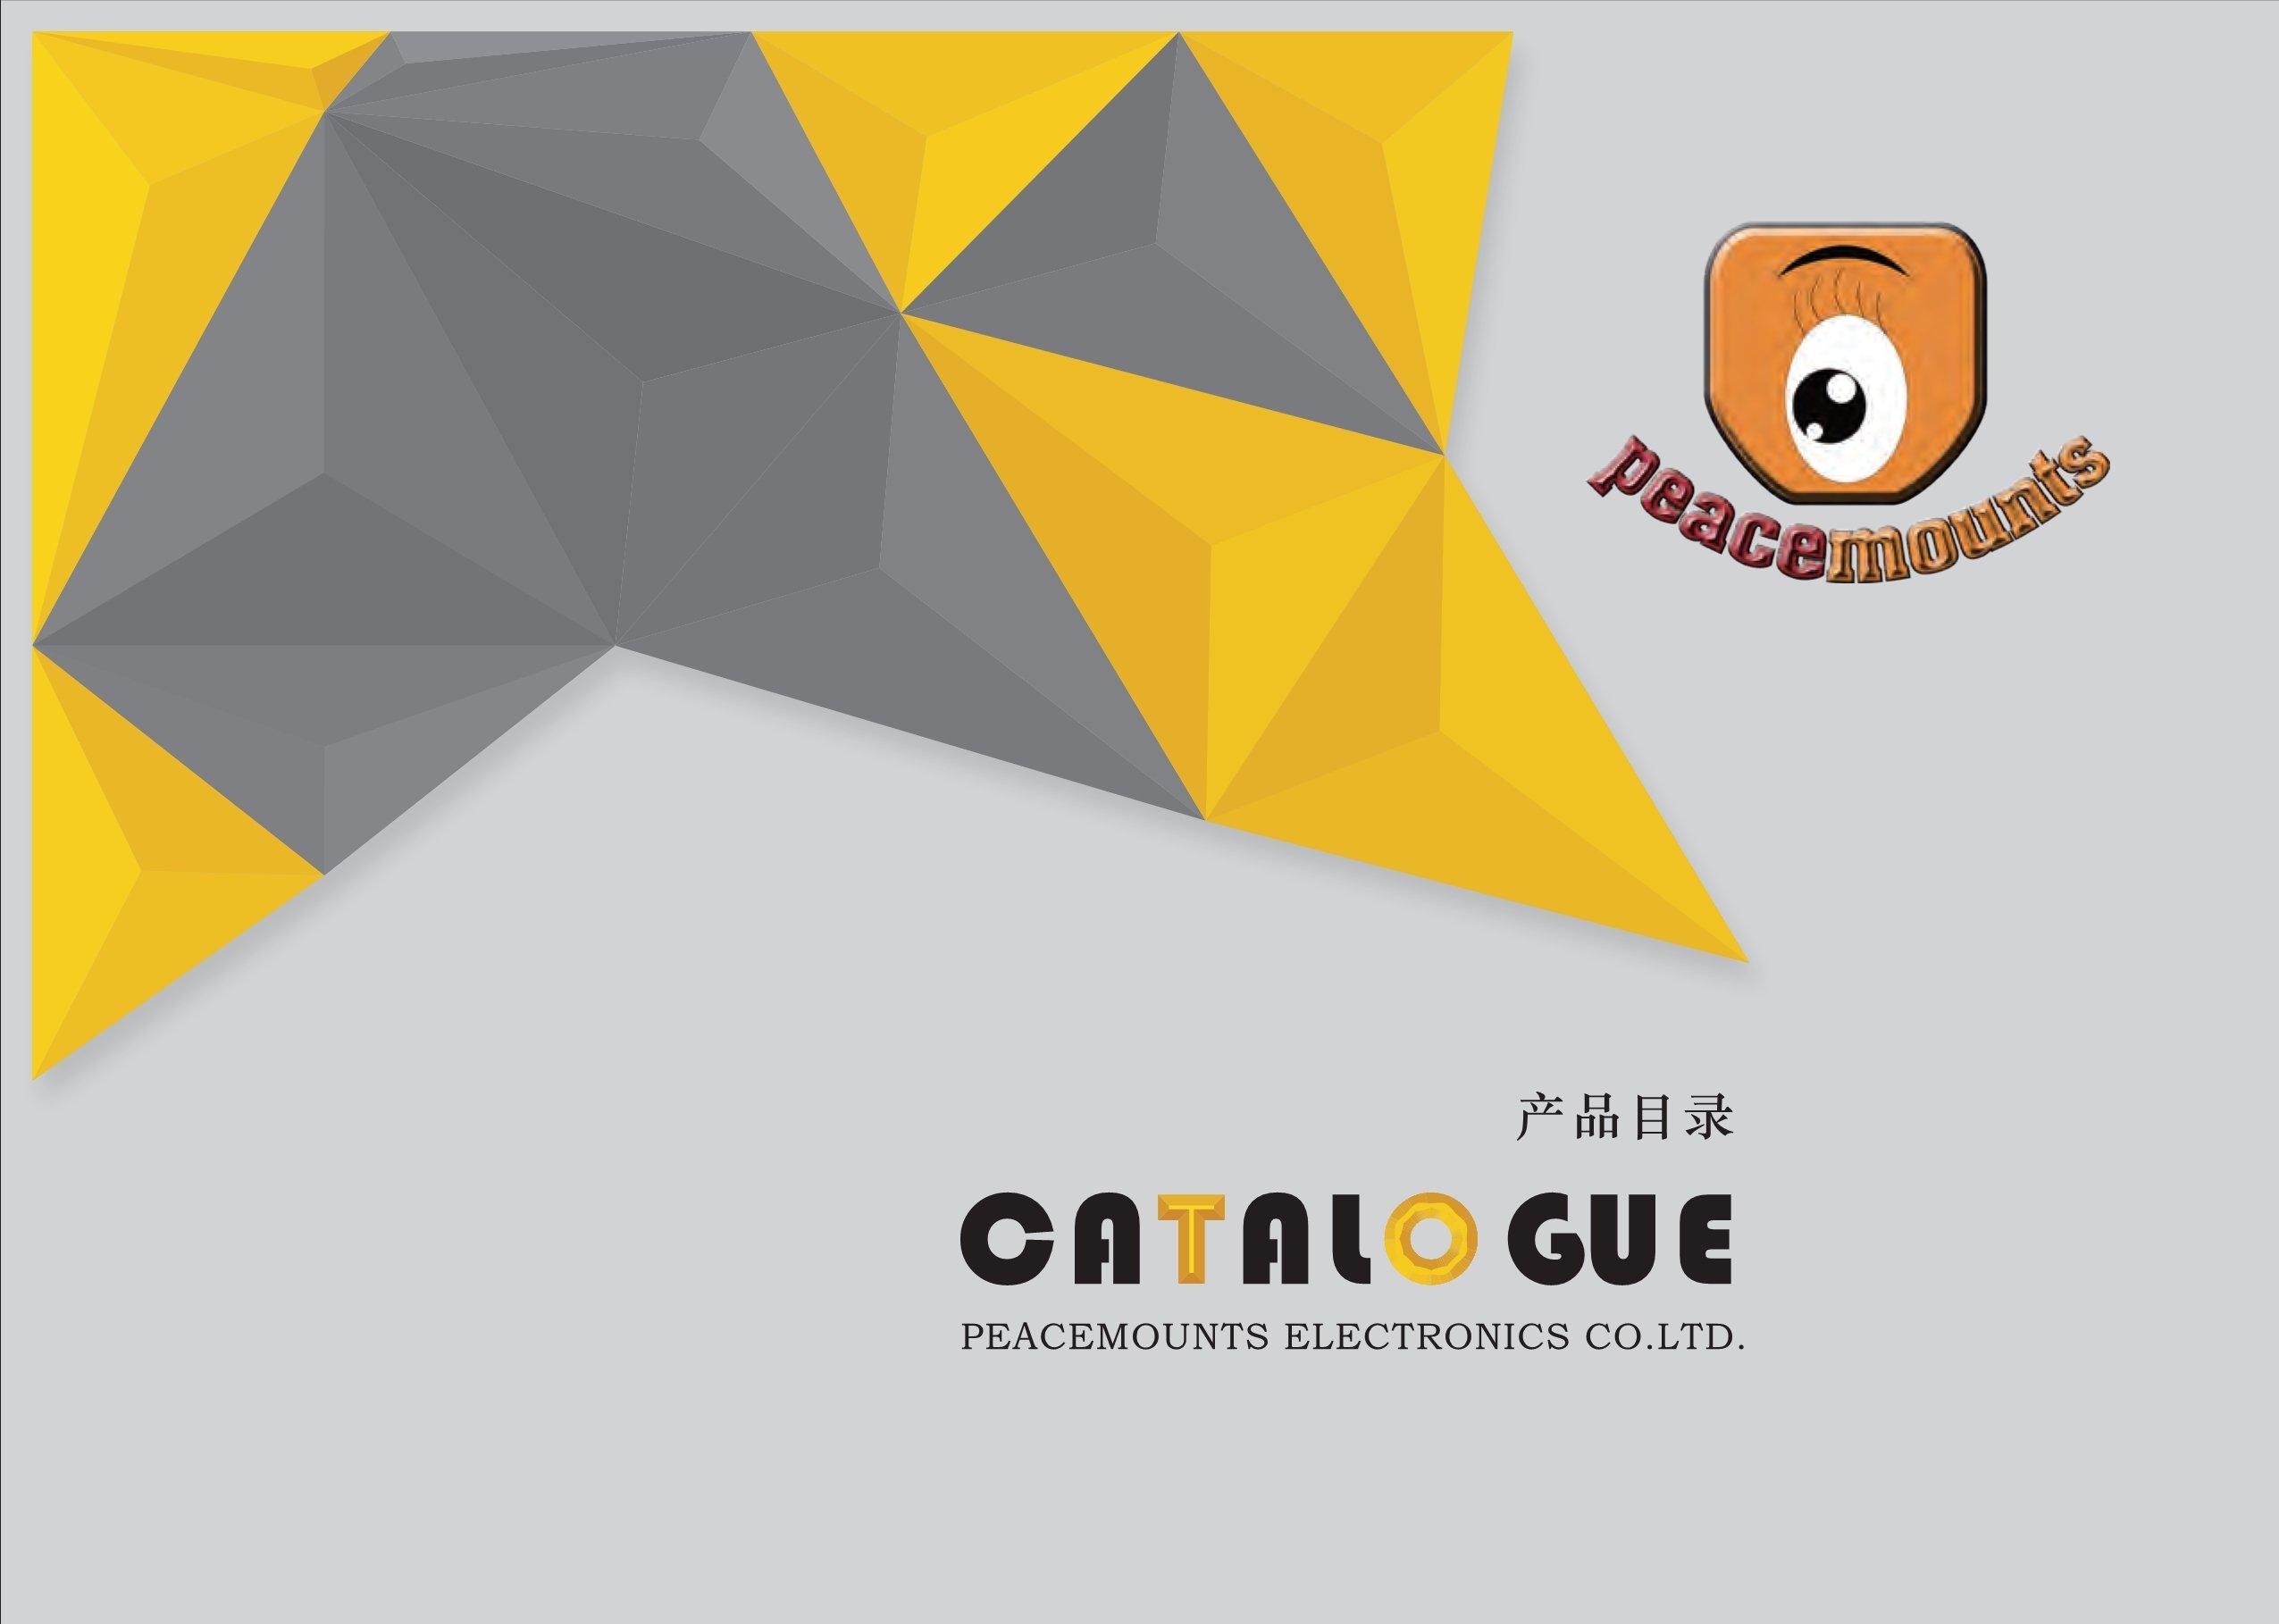 New product catalog